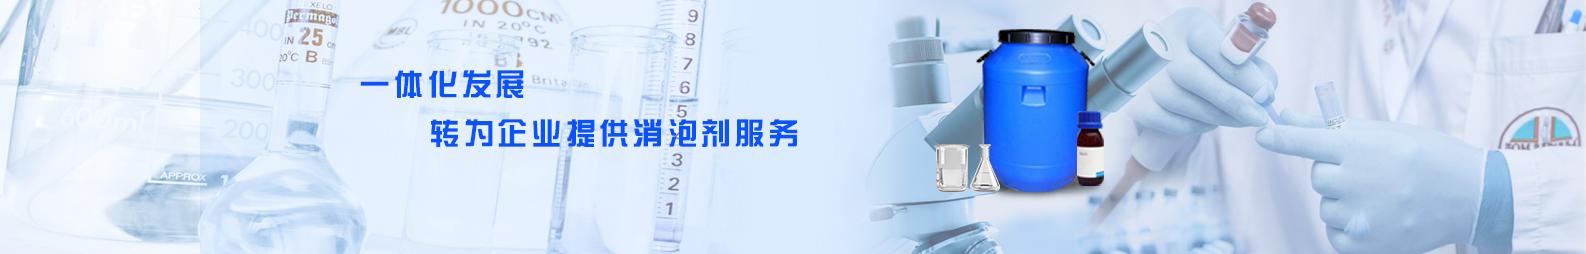 (PVC)PE脱模剂